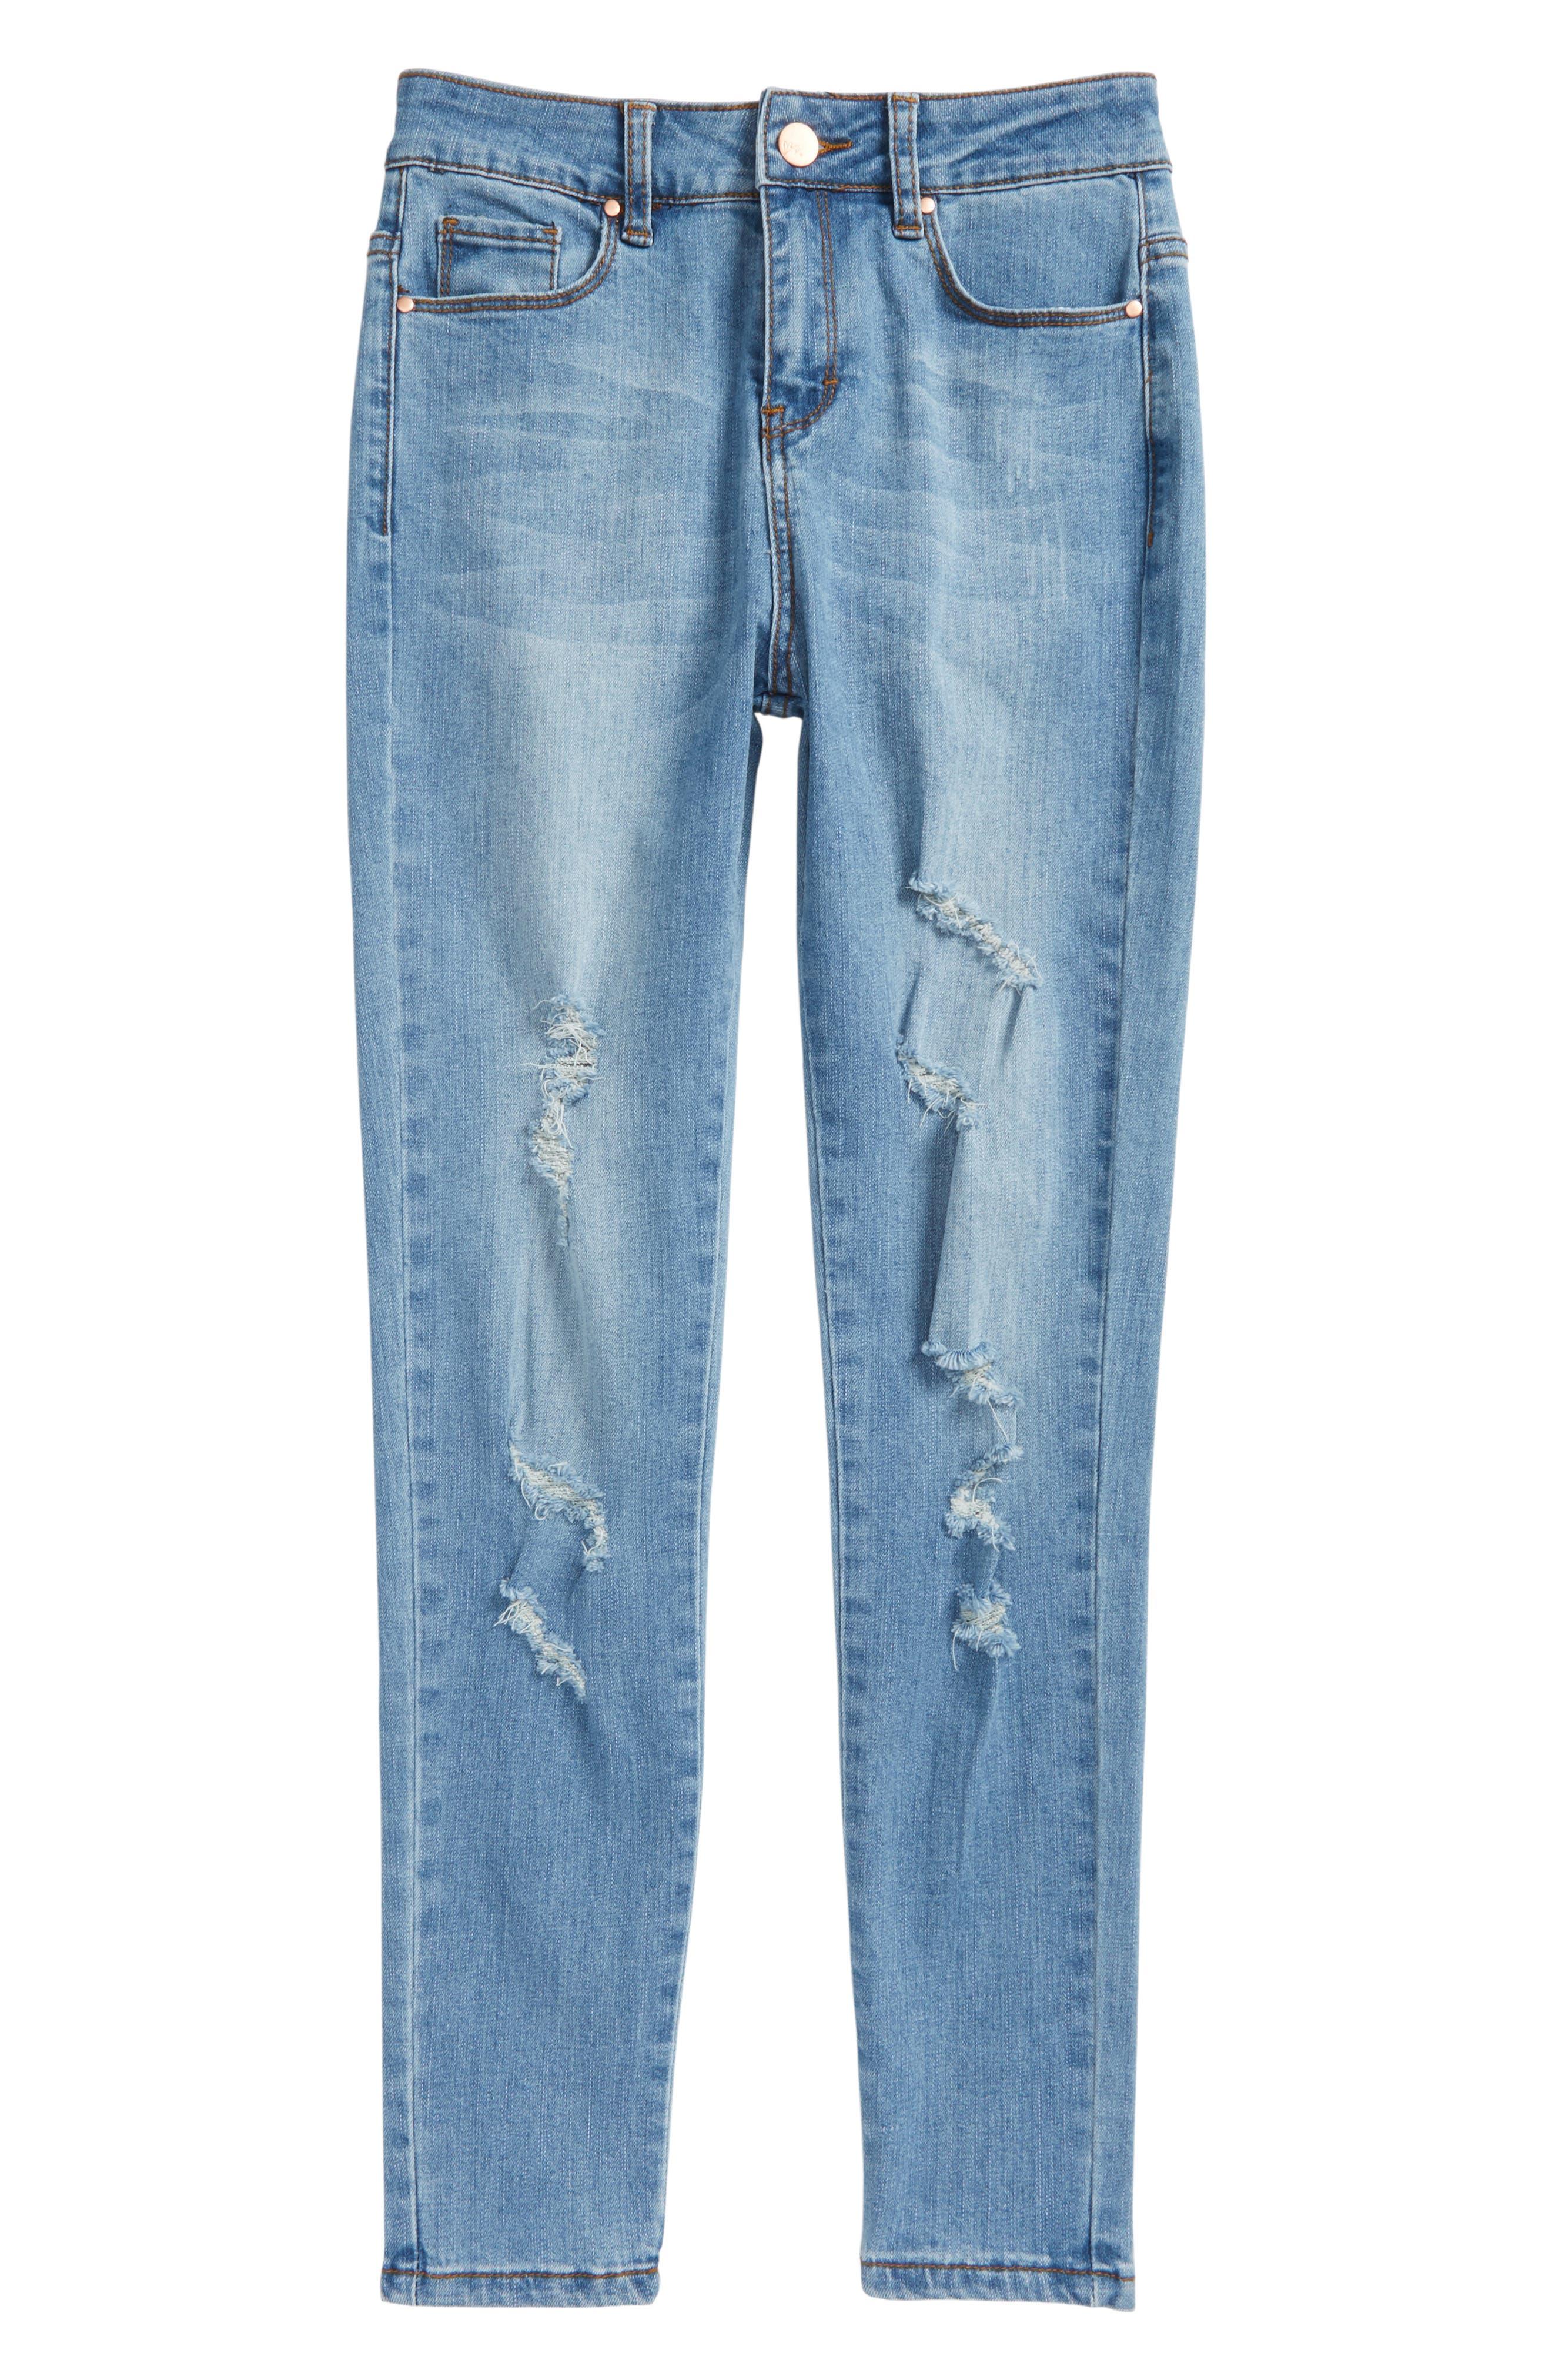 Main Image - Maddie Distressed Skinny Jeans (Big Girls)